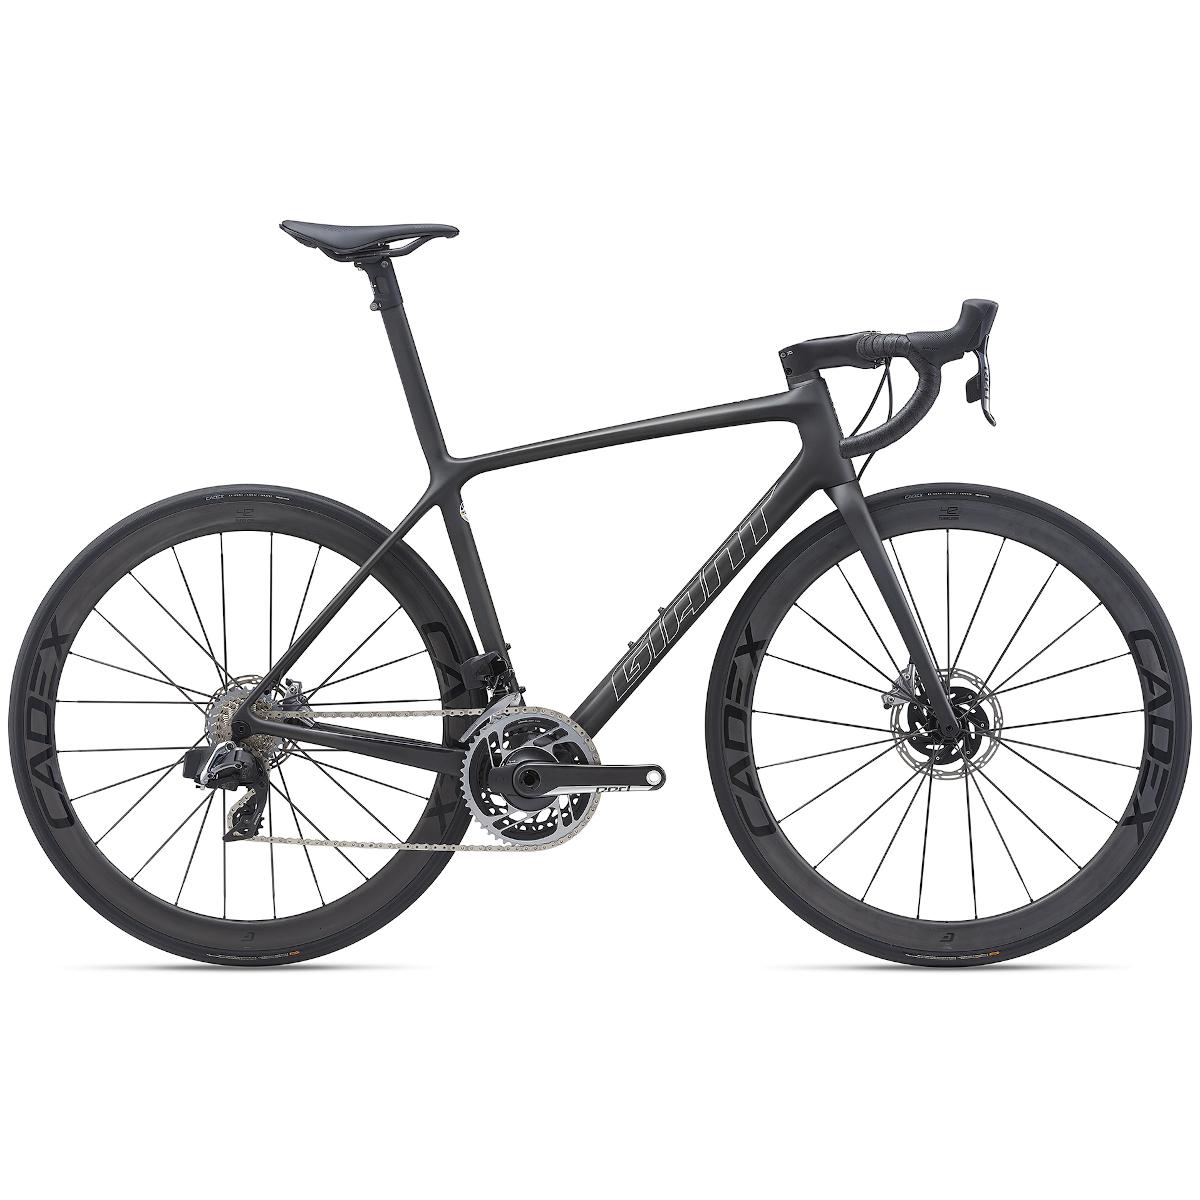 Giant TCR Advanced SL Disc SRAM RED eTap AXS Carbon - Bicicleta Carretera - 2021 - raw carbon